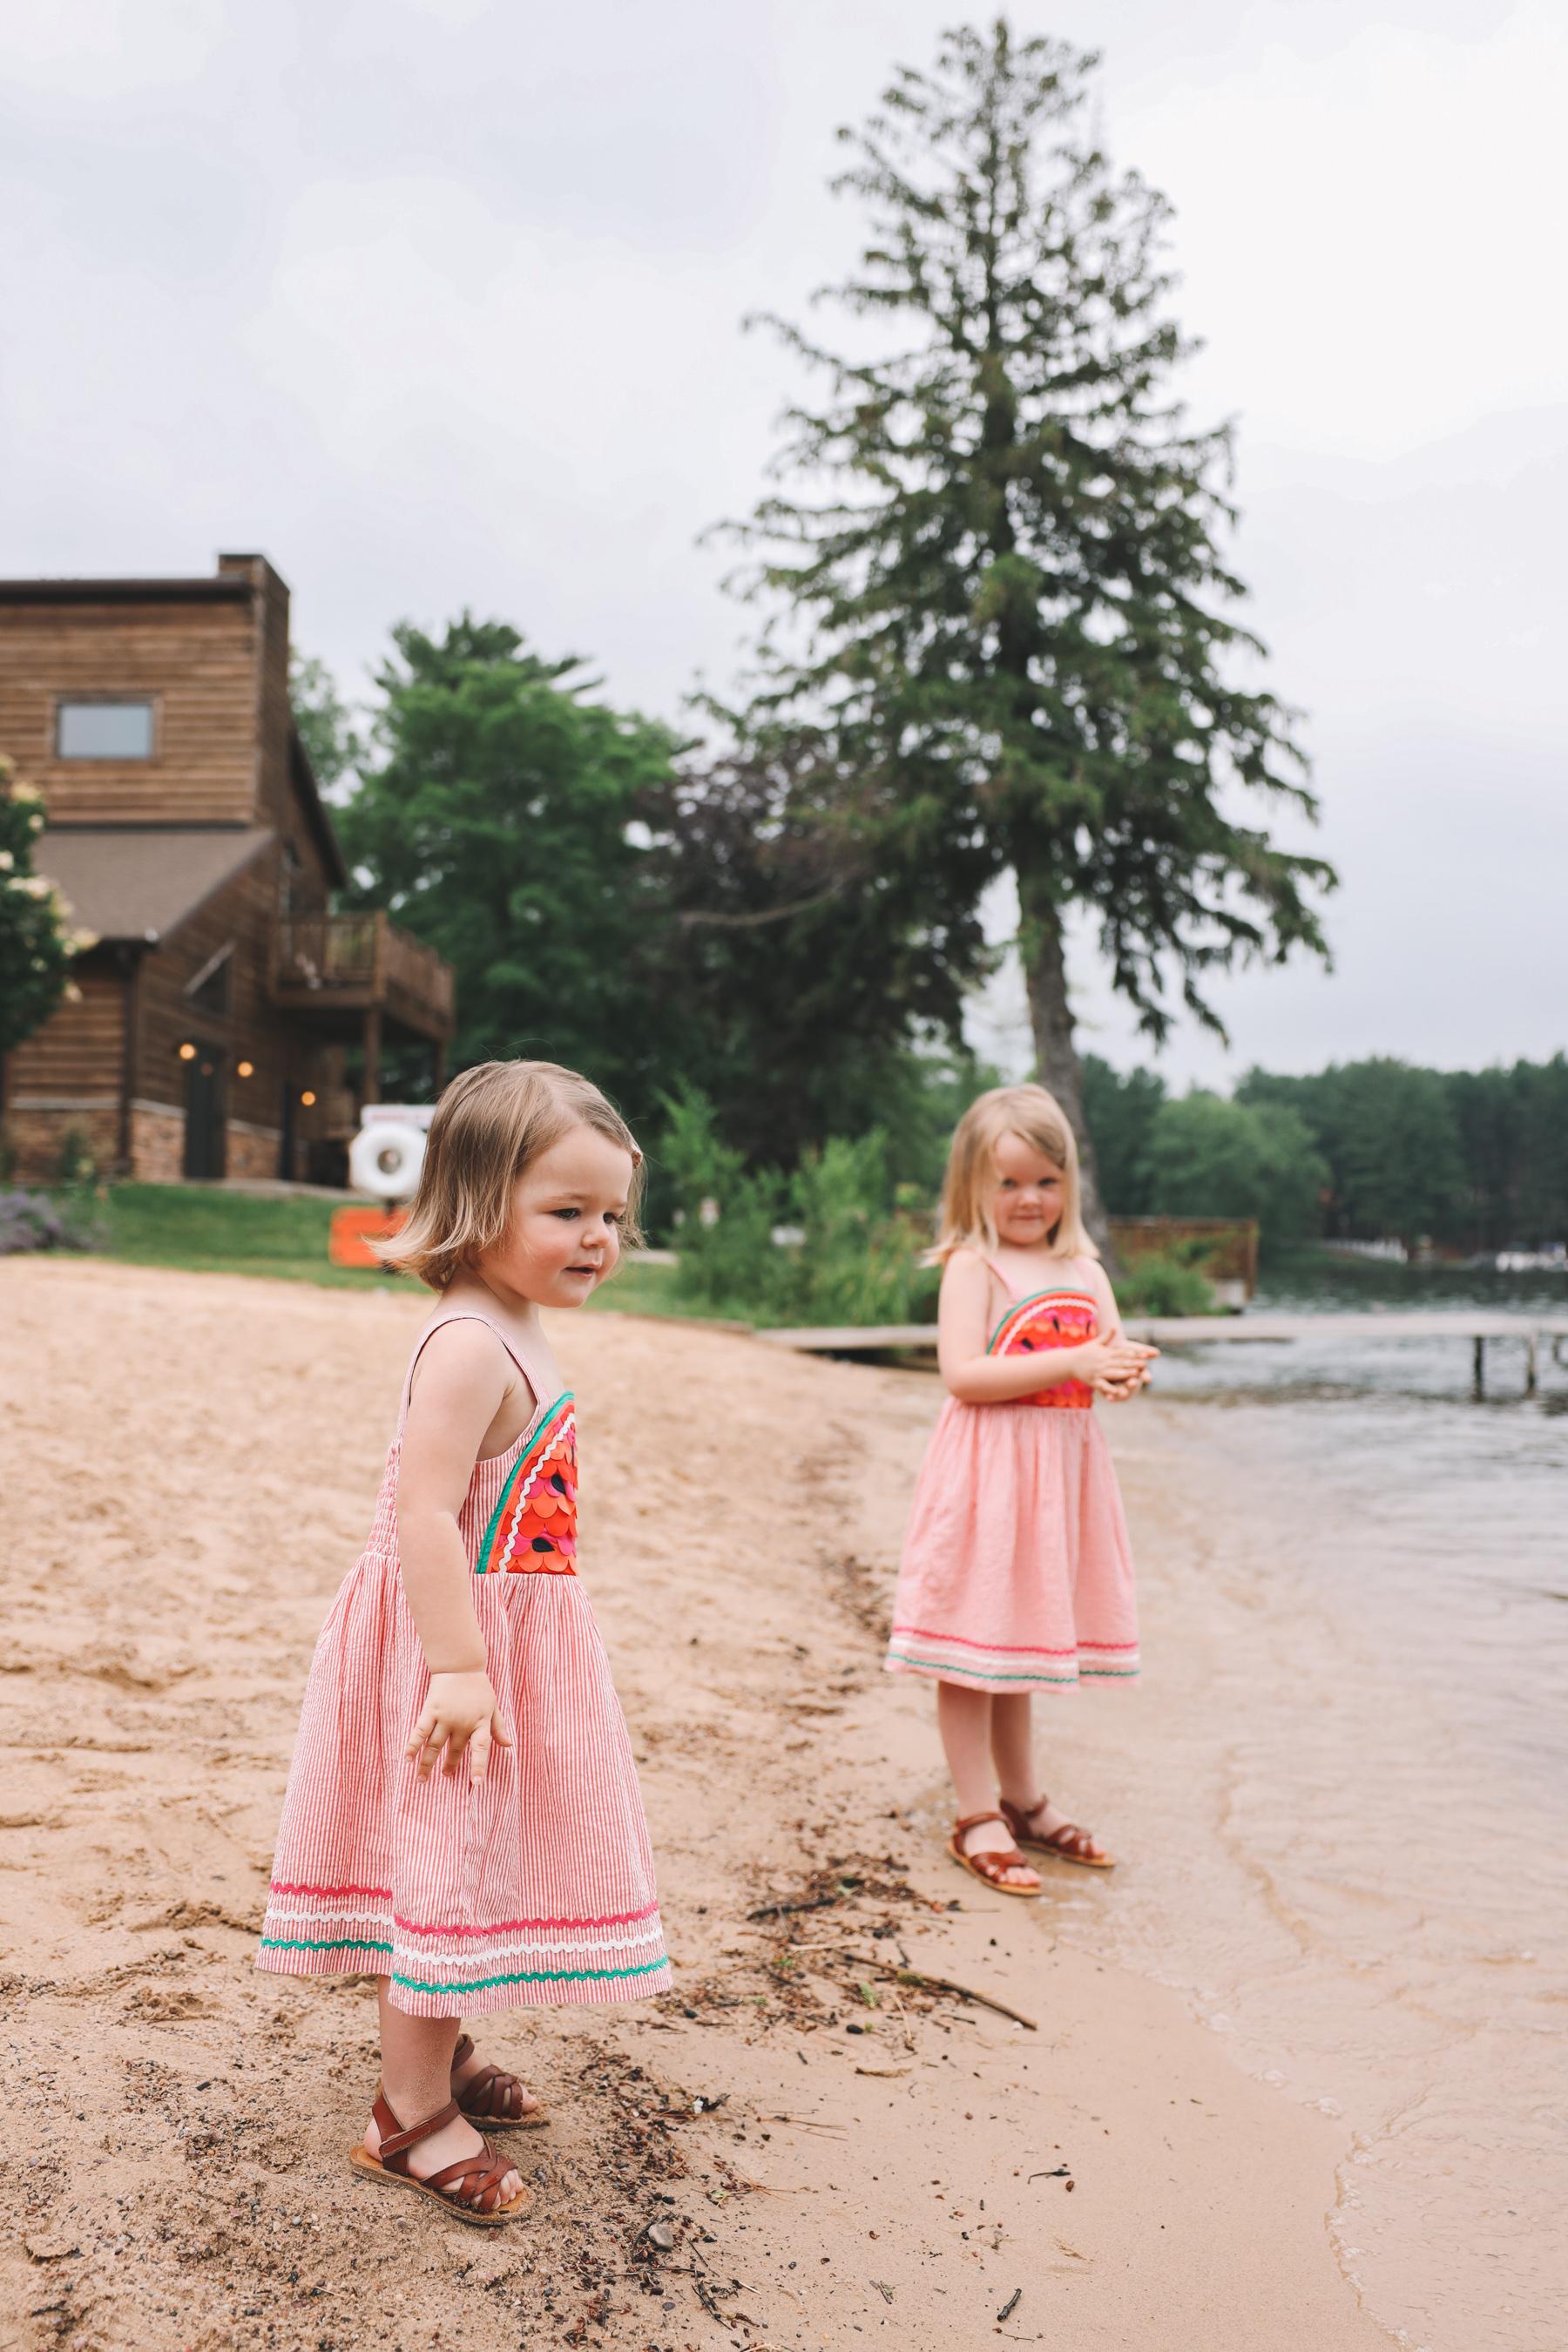 Wisconsin Dells Trip